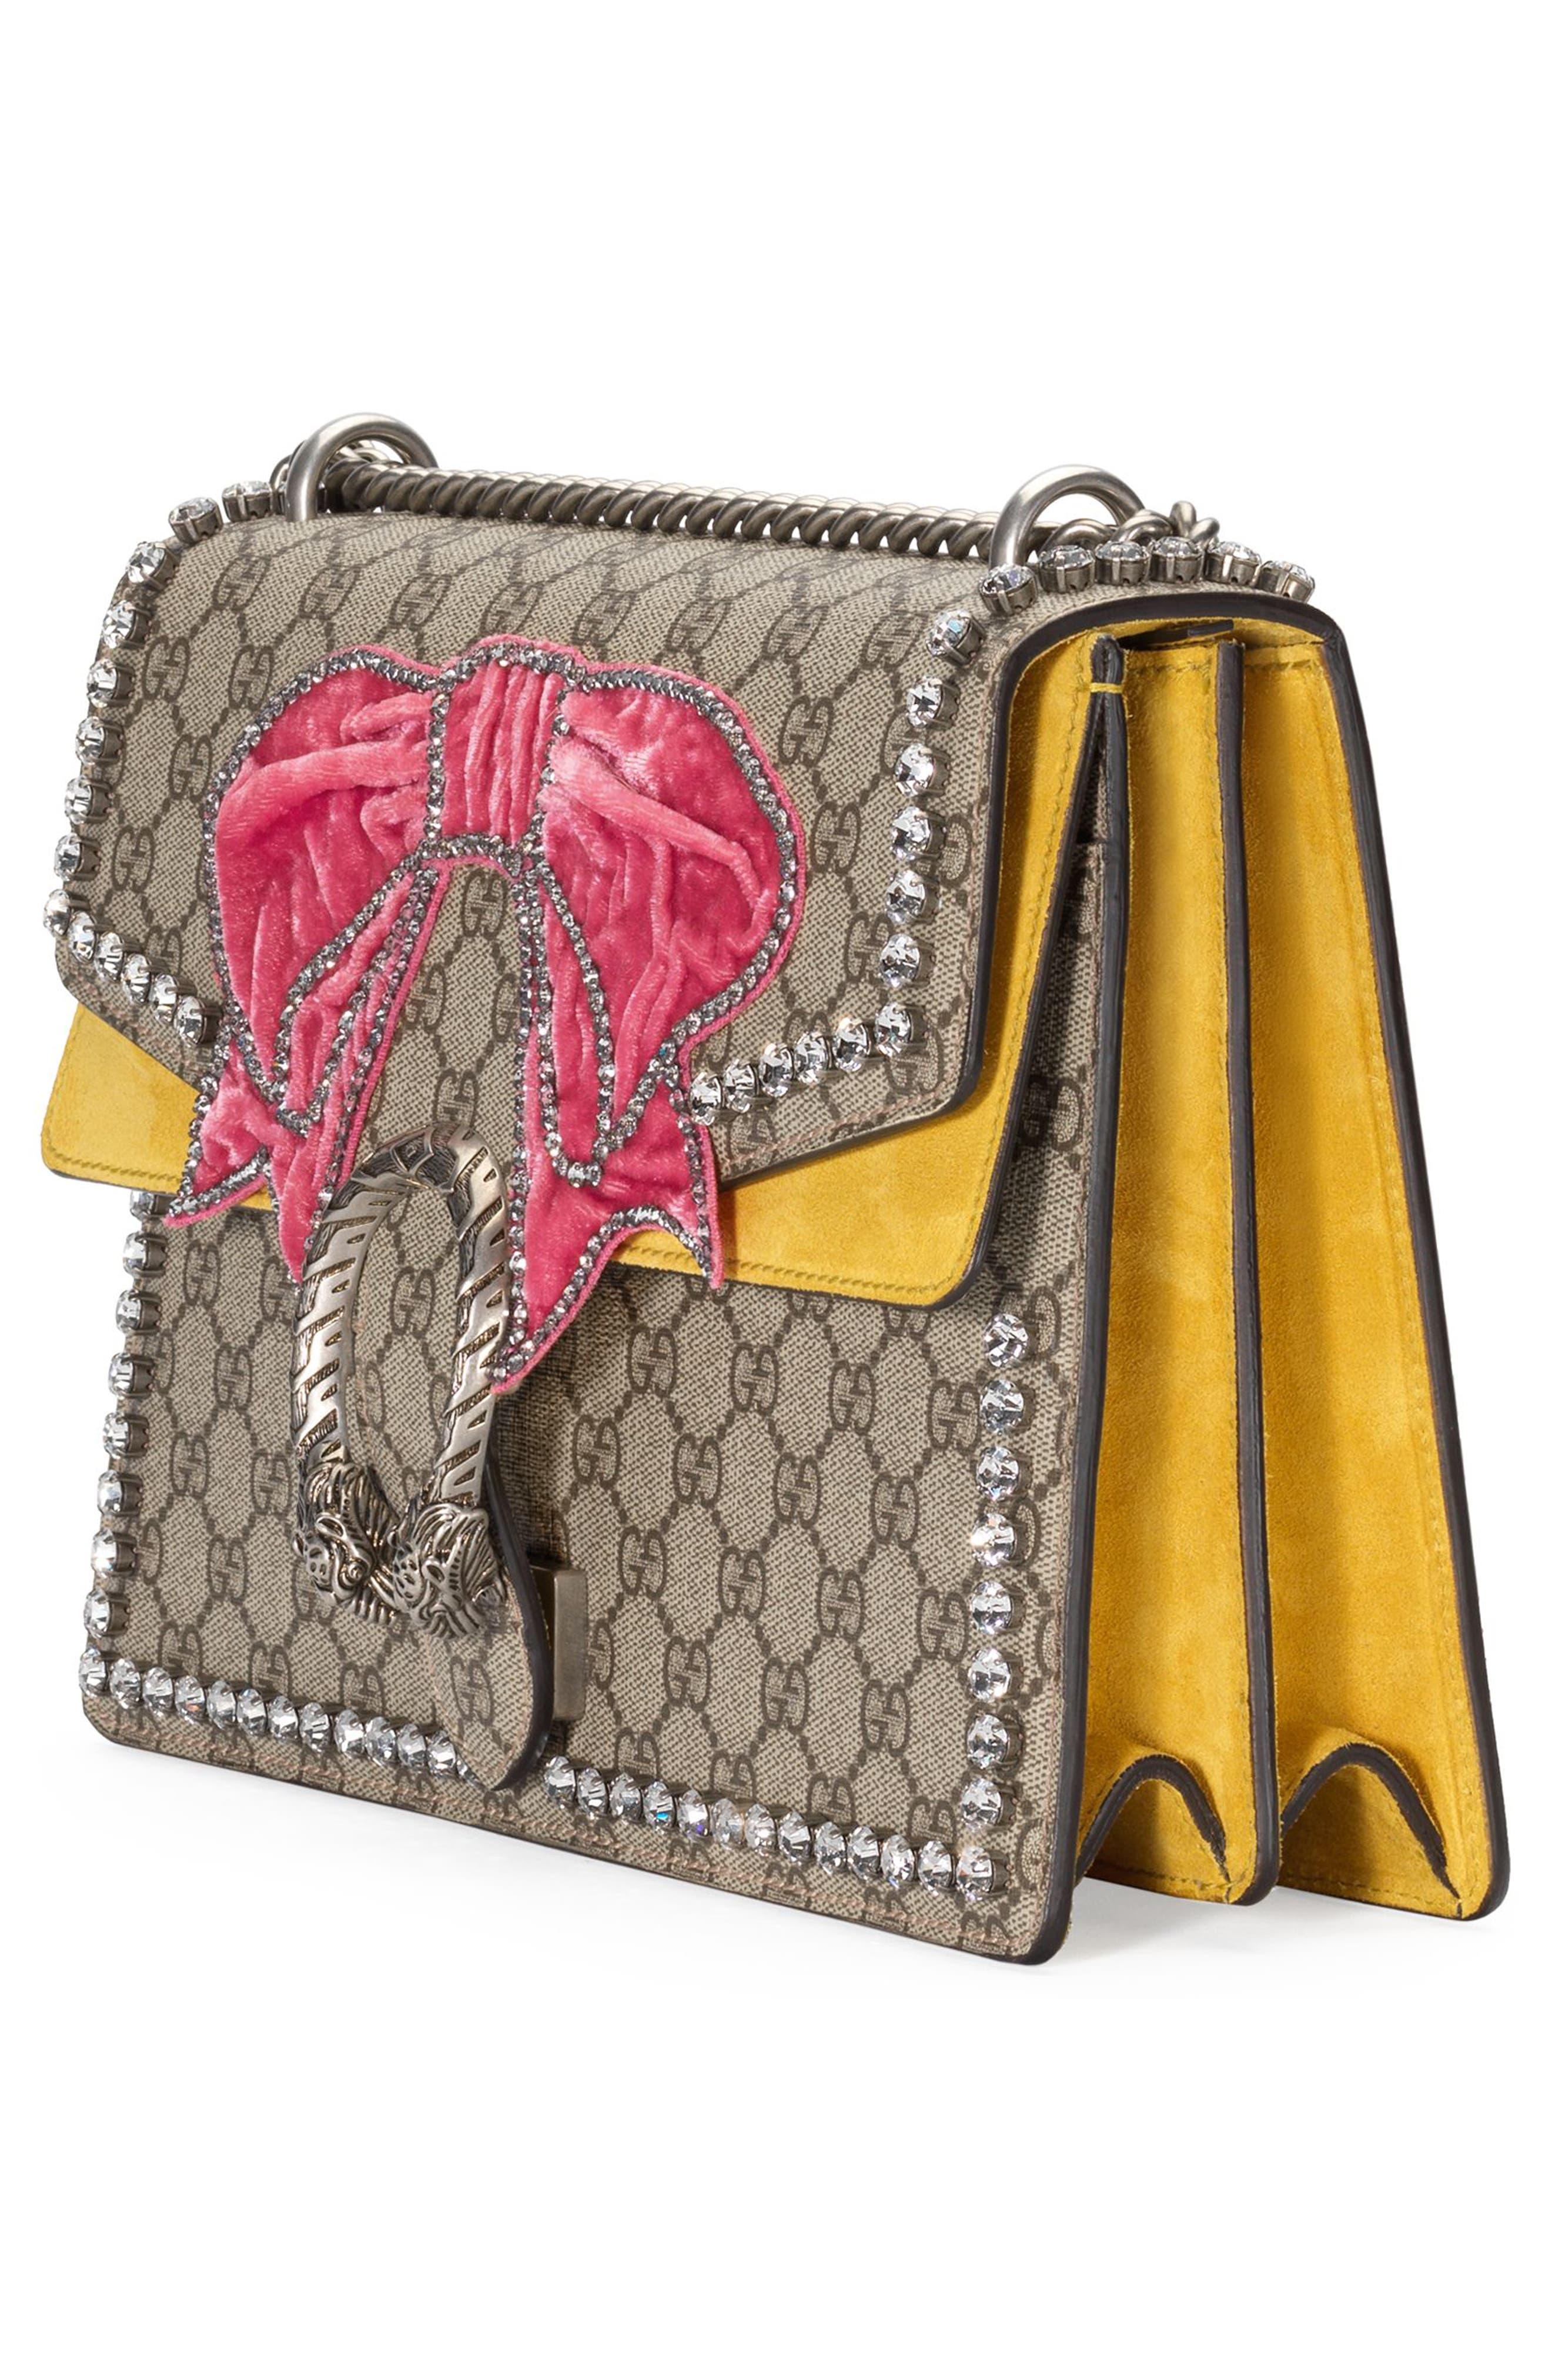 Medium Dionysus GG Supreme Canvas Shoulder Bag,                             Alternate thumbnail 4, color,                             250